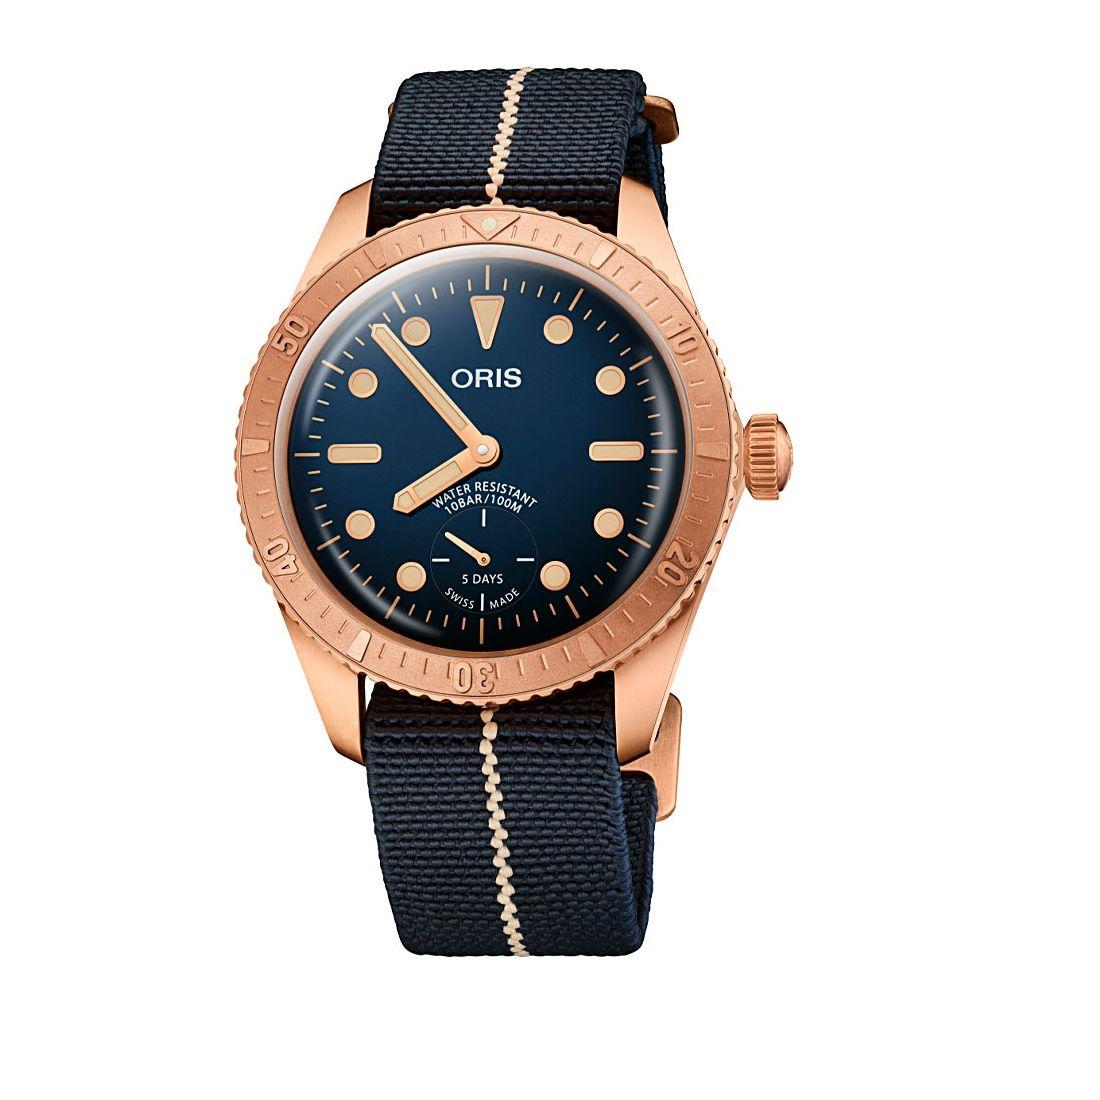 Reloj Oris Carl Brashear Calibre 401 Limited Edition - 01 401 7764 3185-Set  - 1